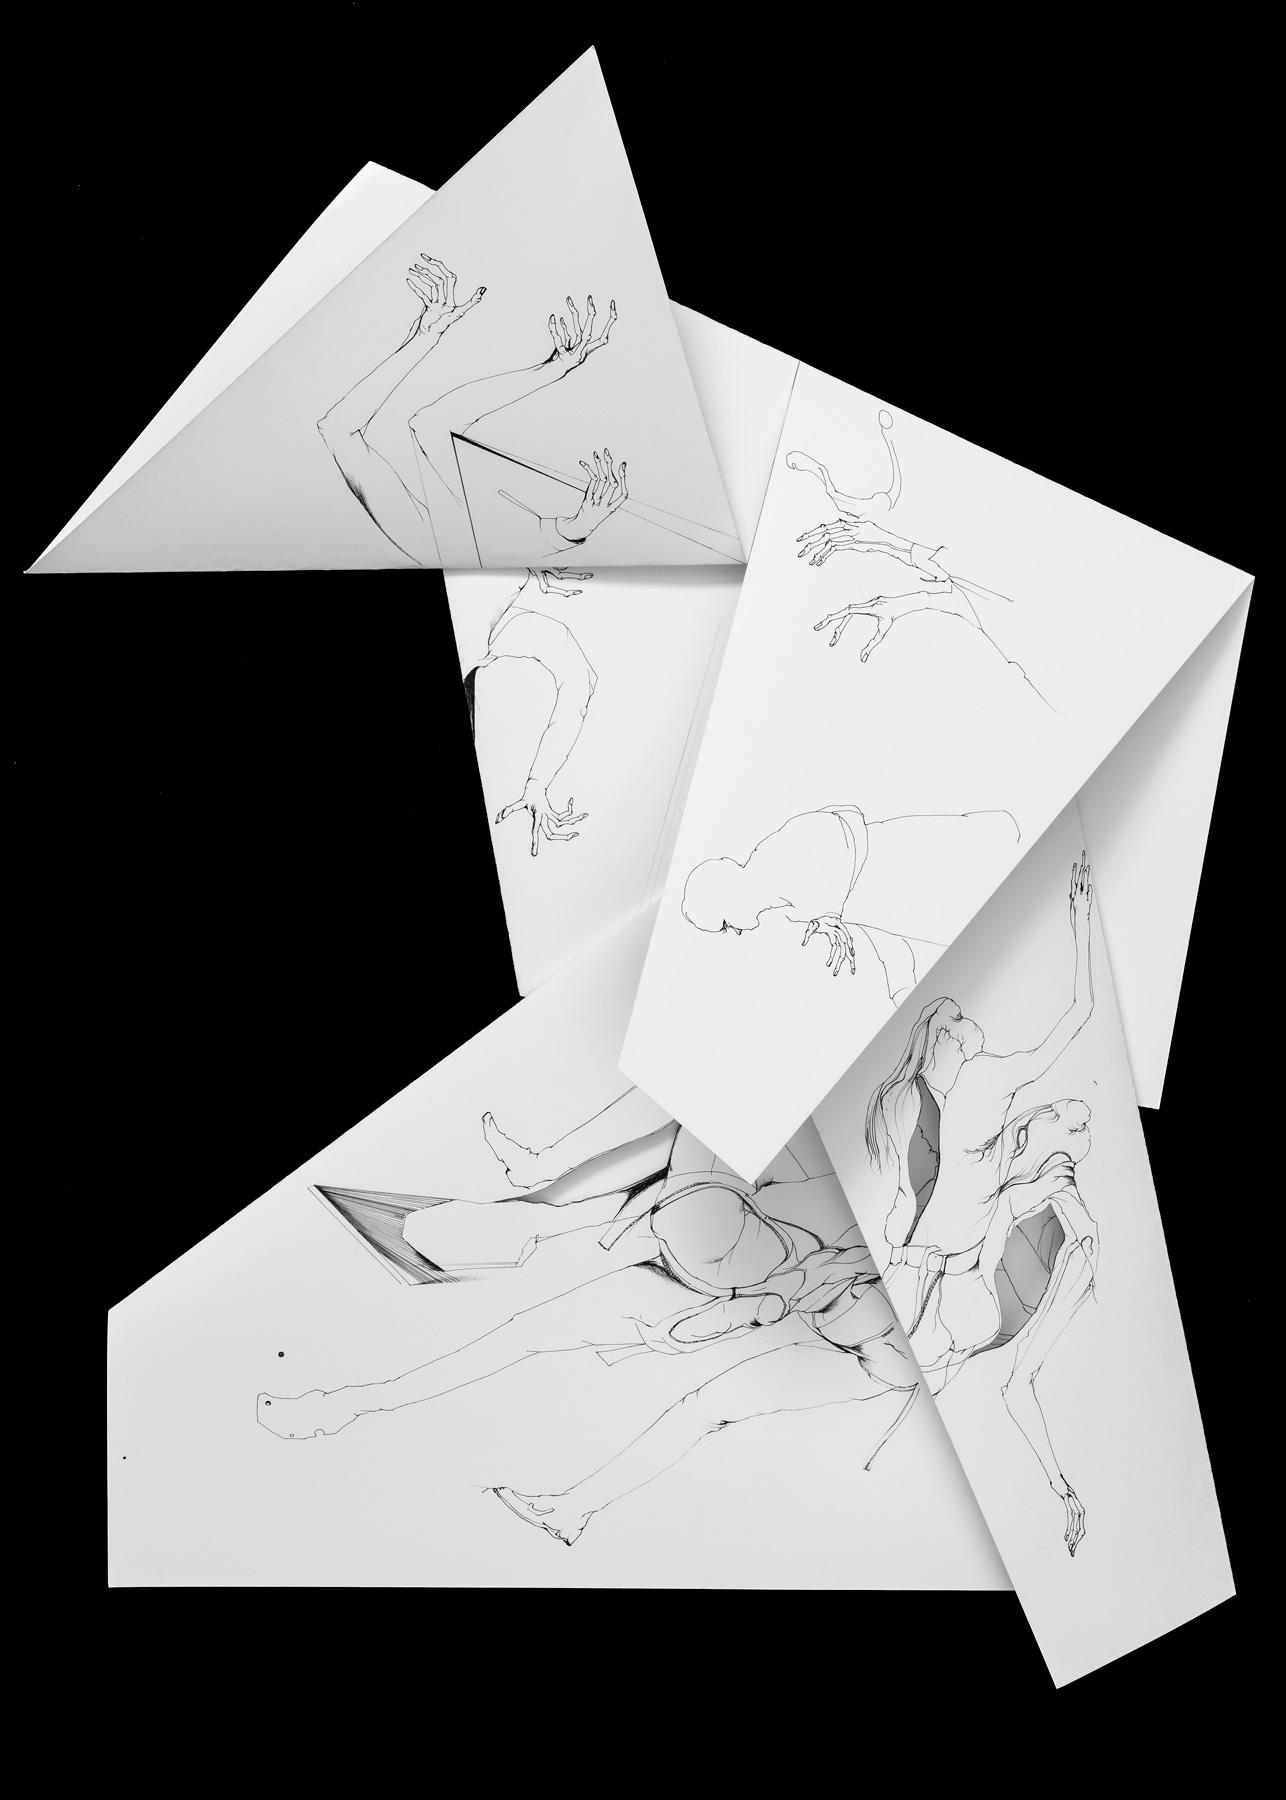 Nina Annabelle Märkl   Fragmented fiction 23   Ink on folded paper, cut-outs   60 x 38 cm   2016